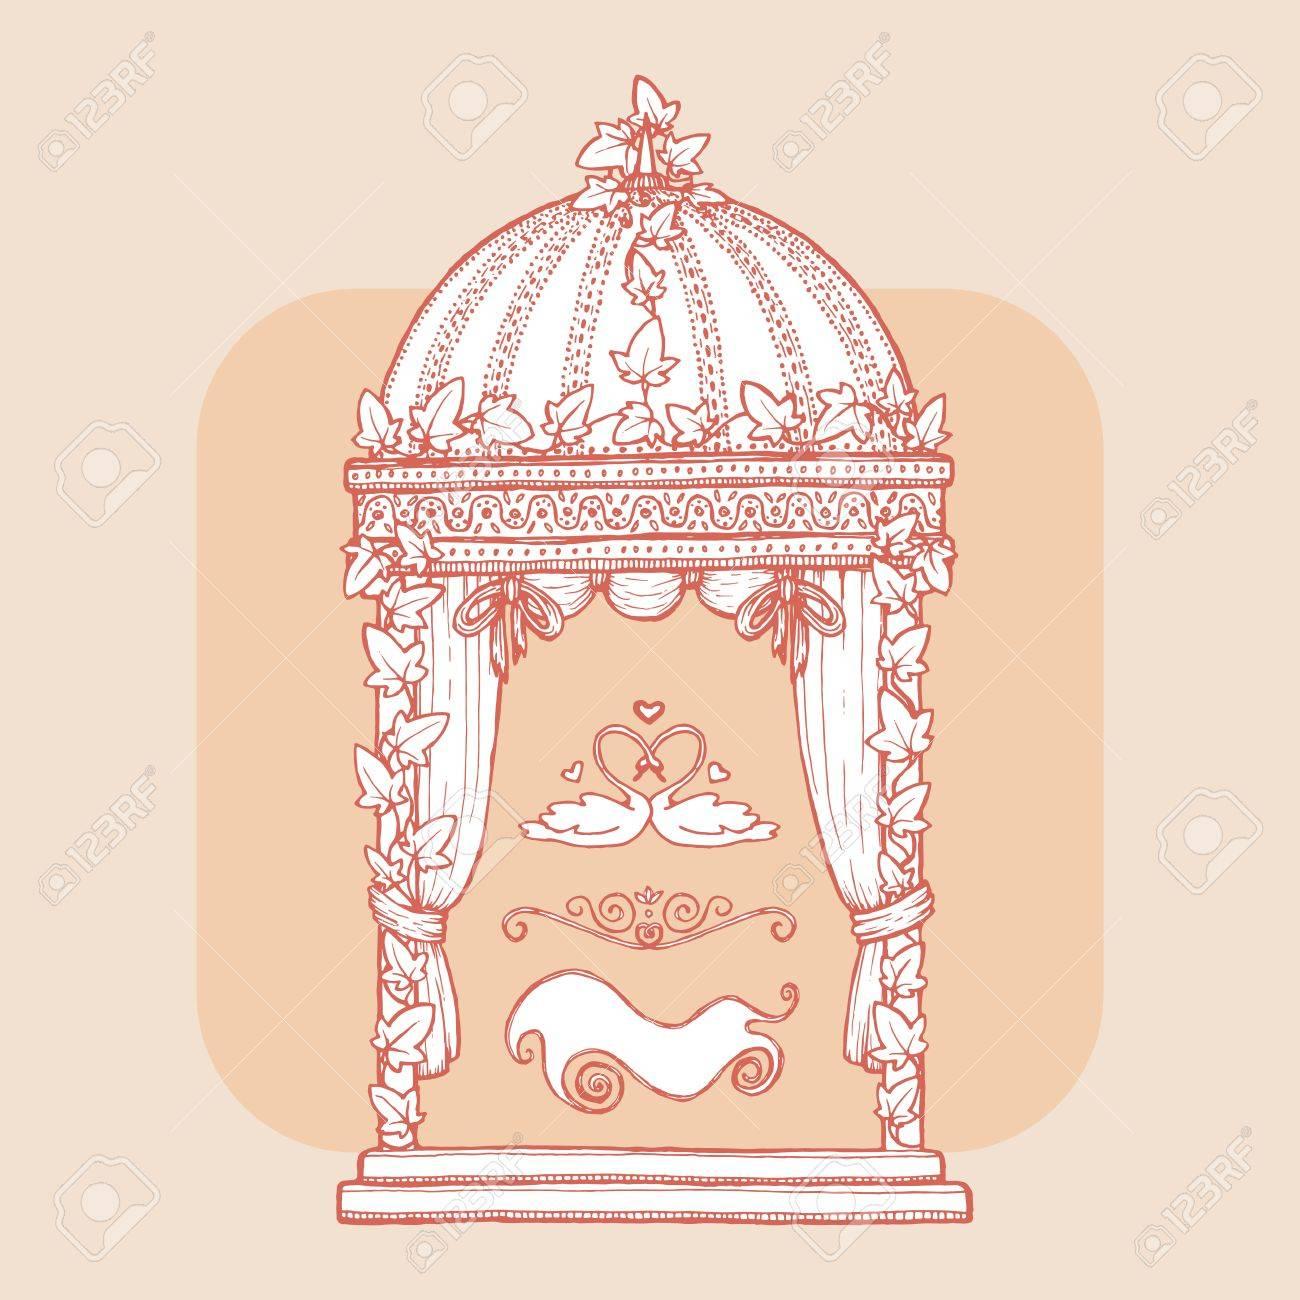 Ivy-covered Wedding Gazebo. Design Element For Wedding Greeting ...